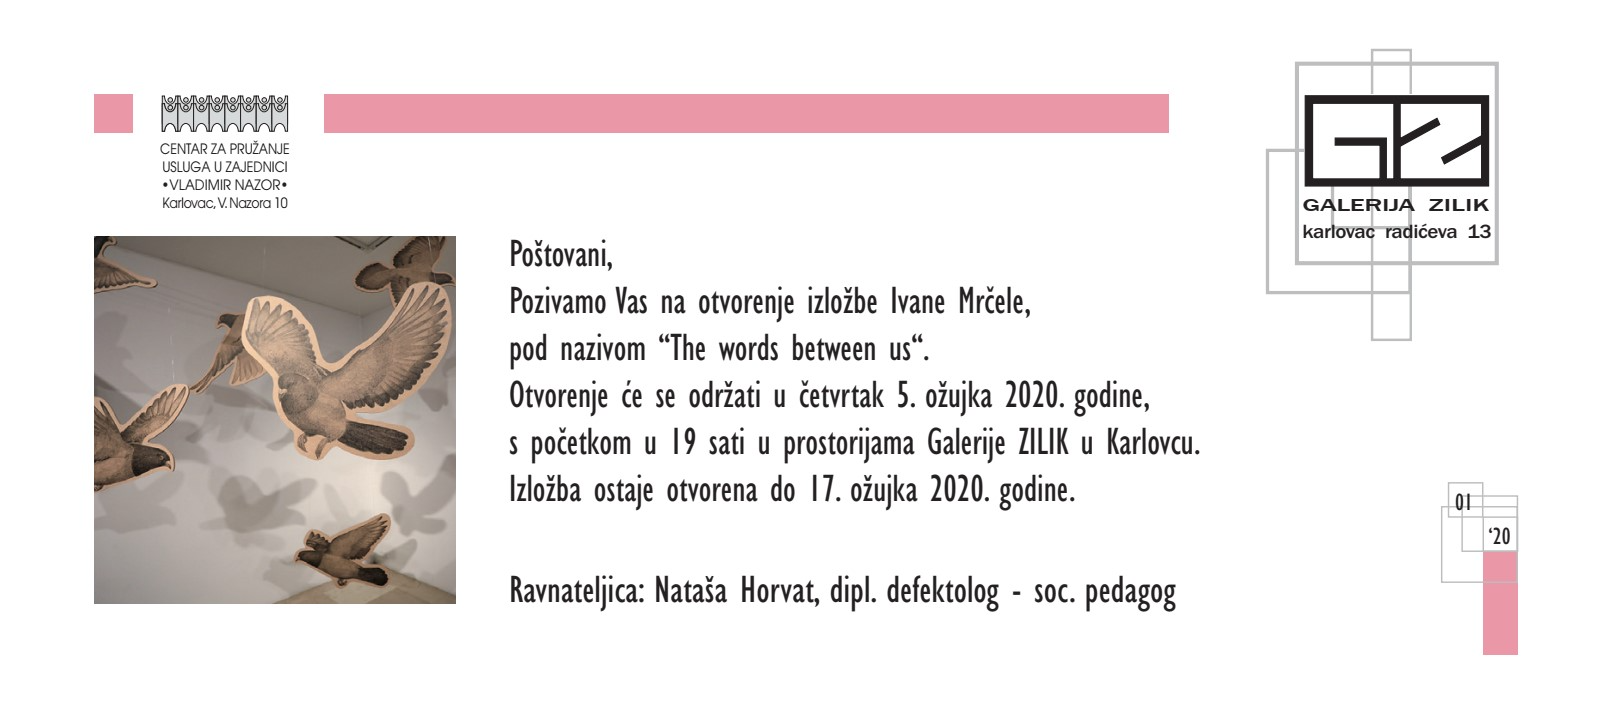 "Najava izložbe: ""The words between us"" - Ivana Mrčela"